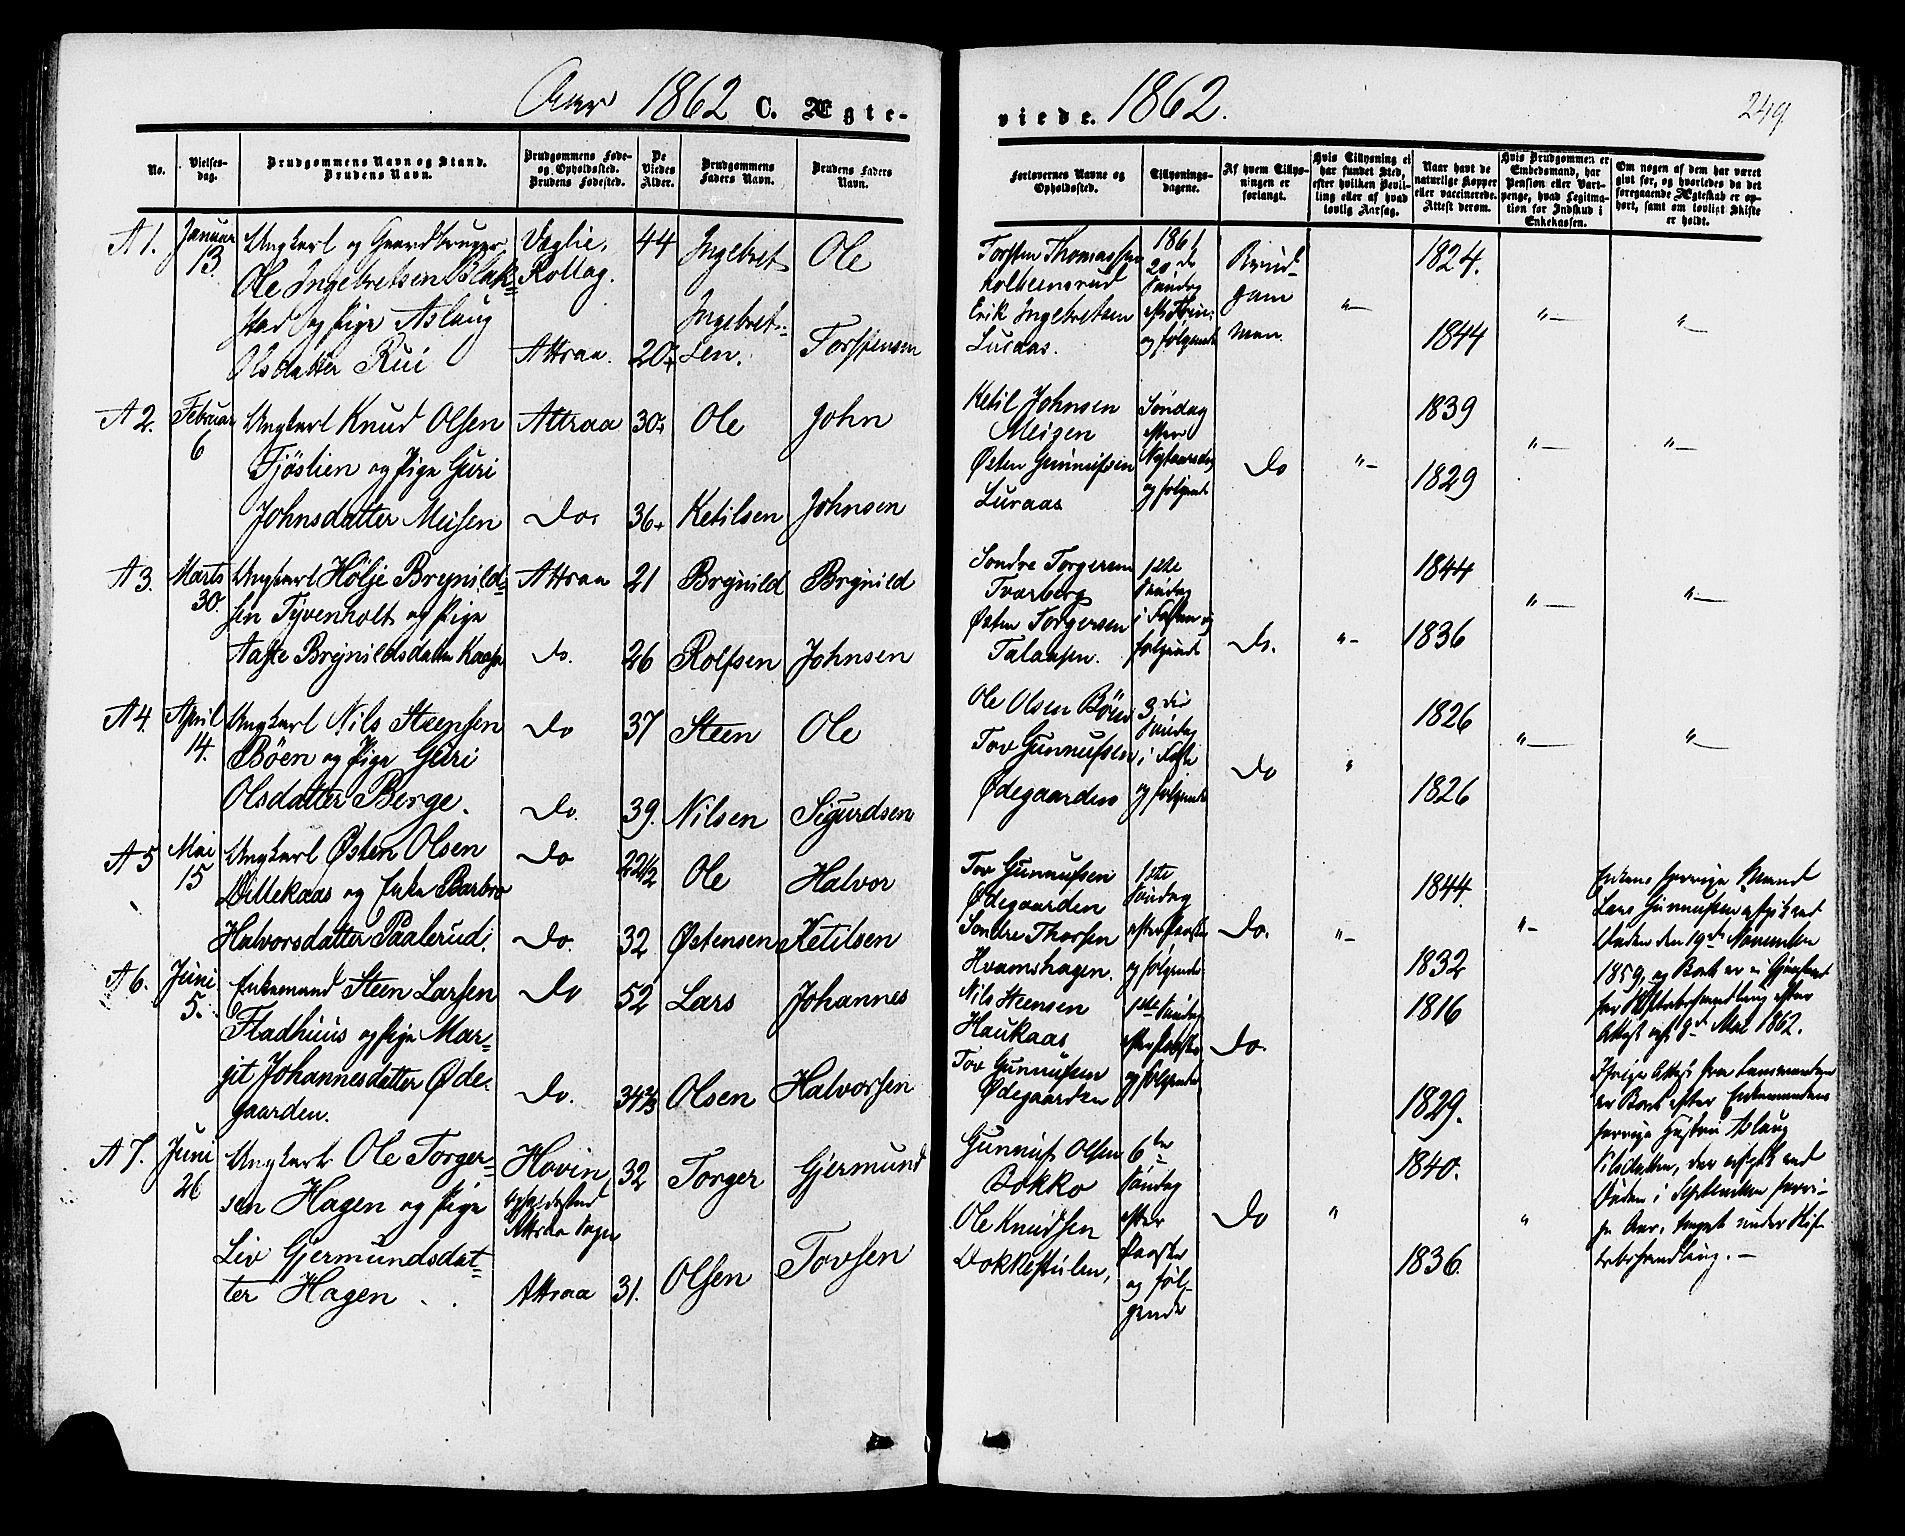 SAKO, Tinn kirkebøker, F/Fa/L0006: Ministerialbok nr. I 6, 1857-1878, s. 249